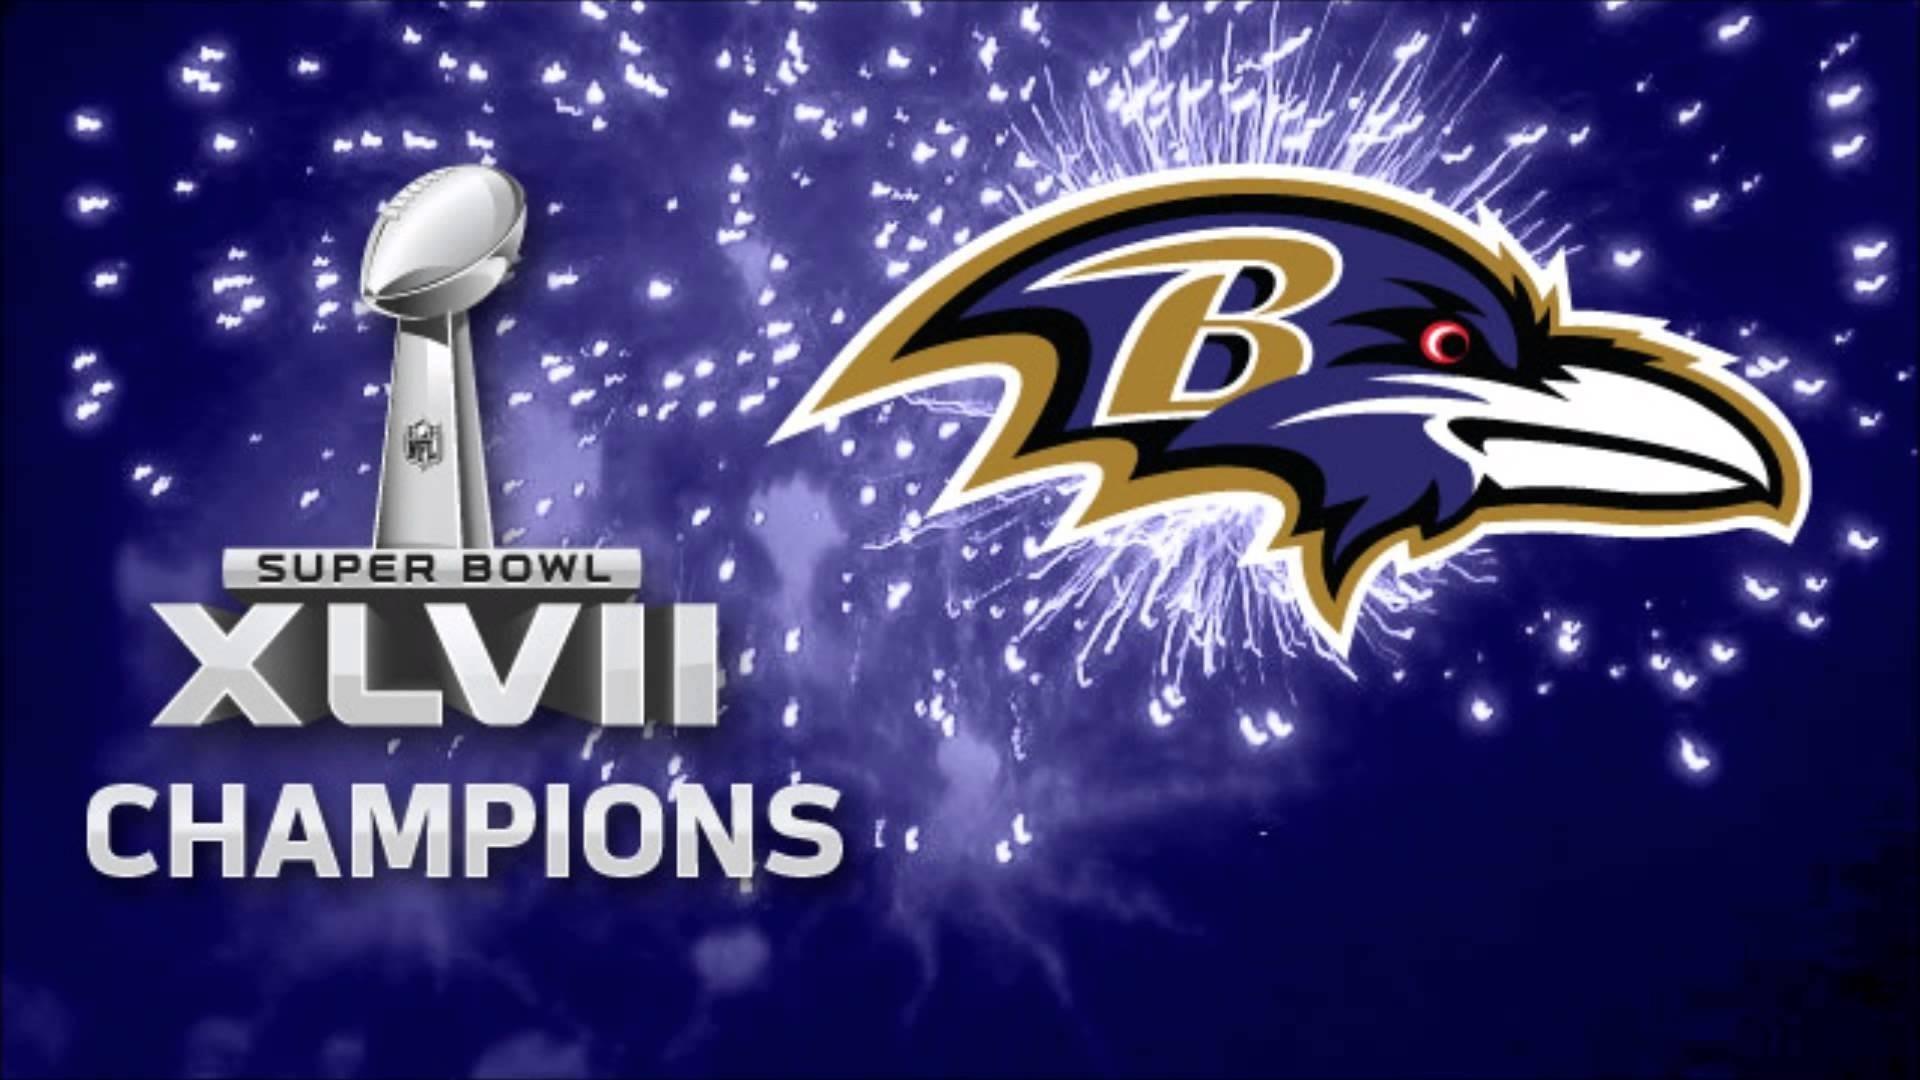 Free Wallpaper Download – thusspokebelinsky: Baltimore Ravens .